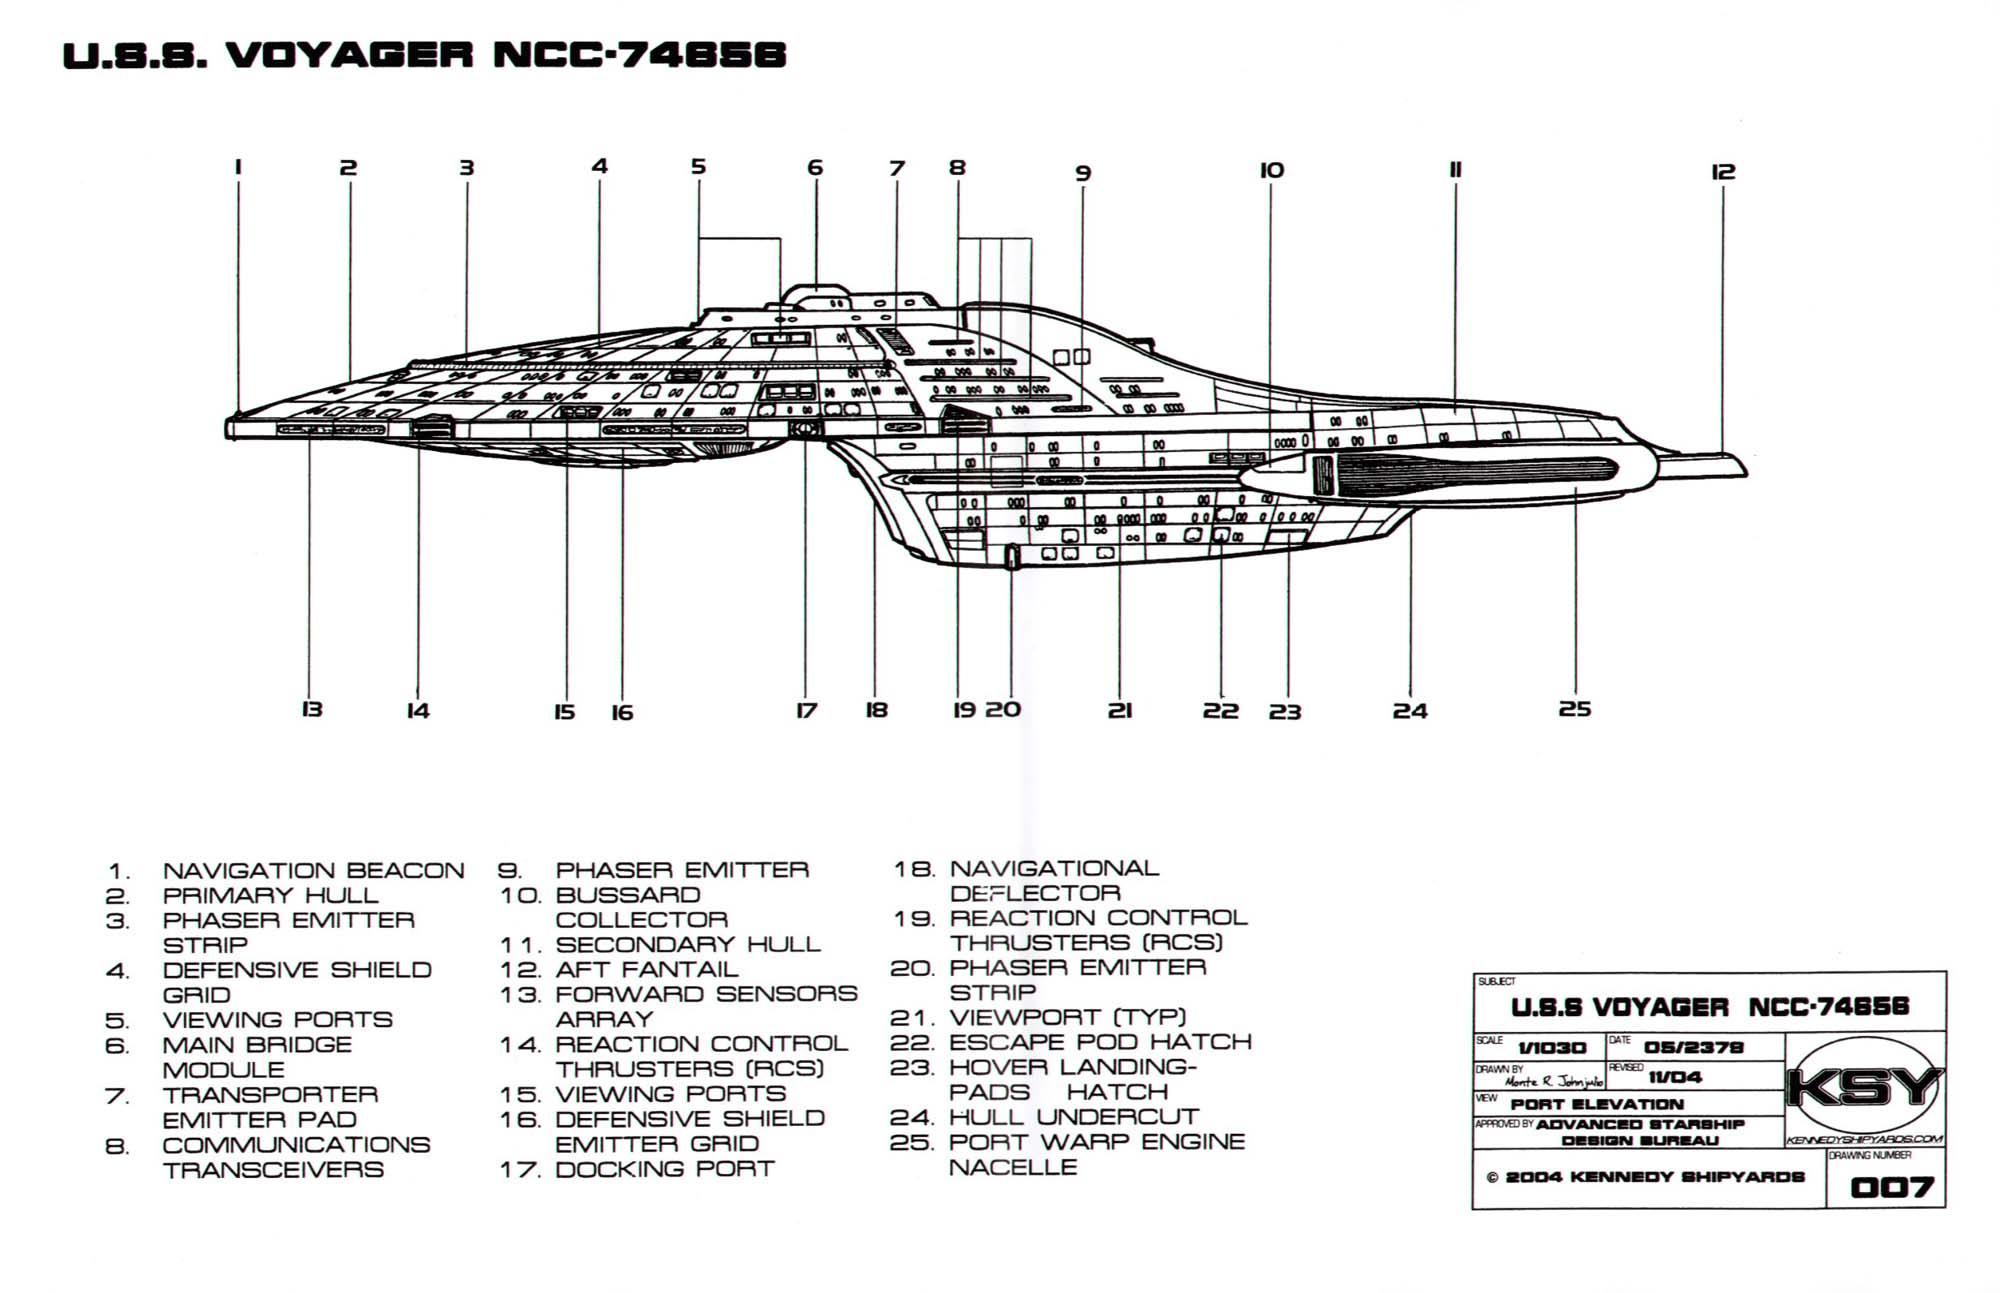 Star Trek Blueprints Intrepid Class Starship Uss Voyager Ncc 74656 Spaceship Engine Diagram